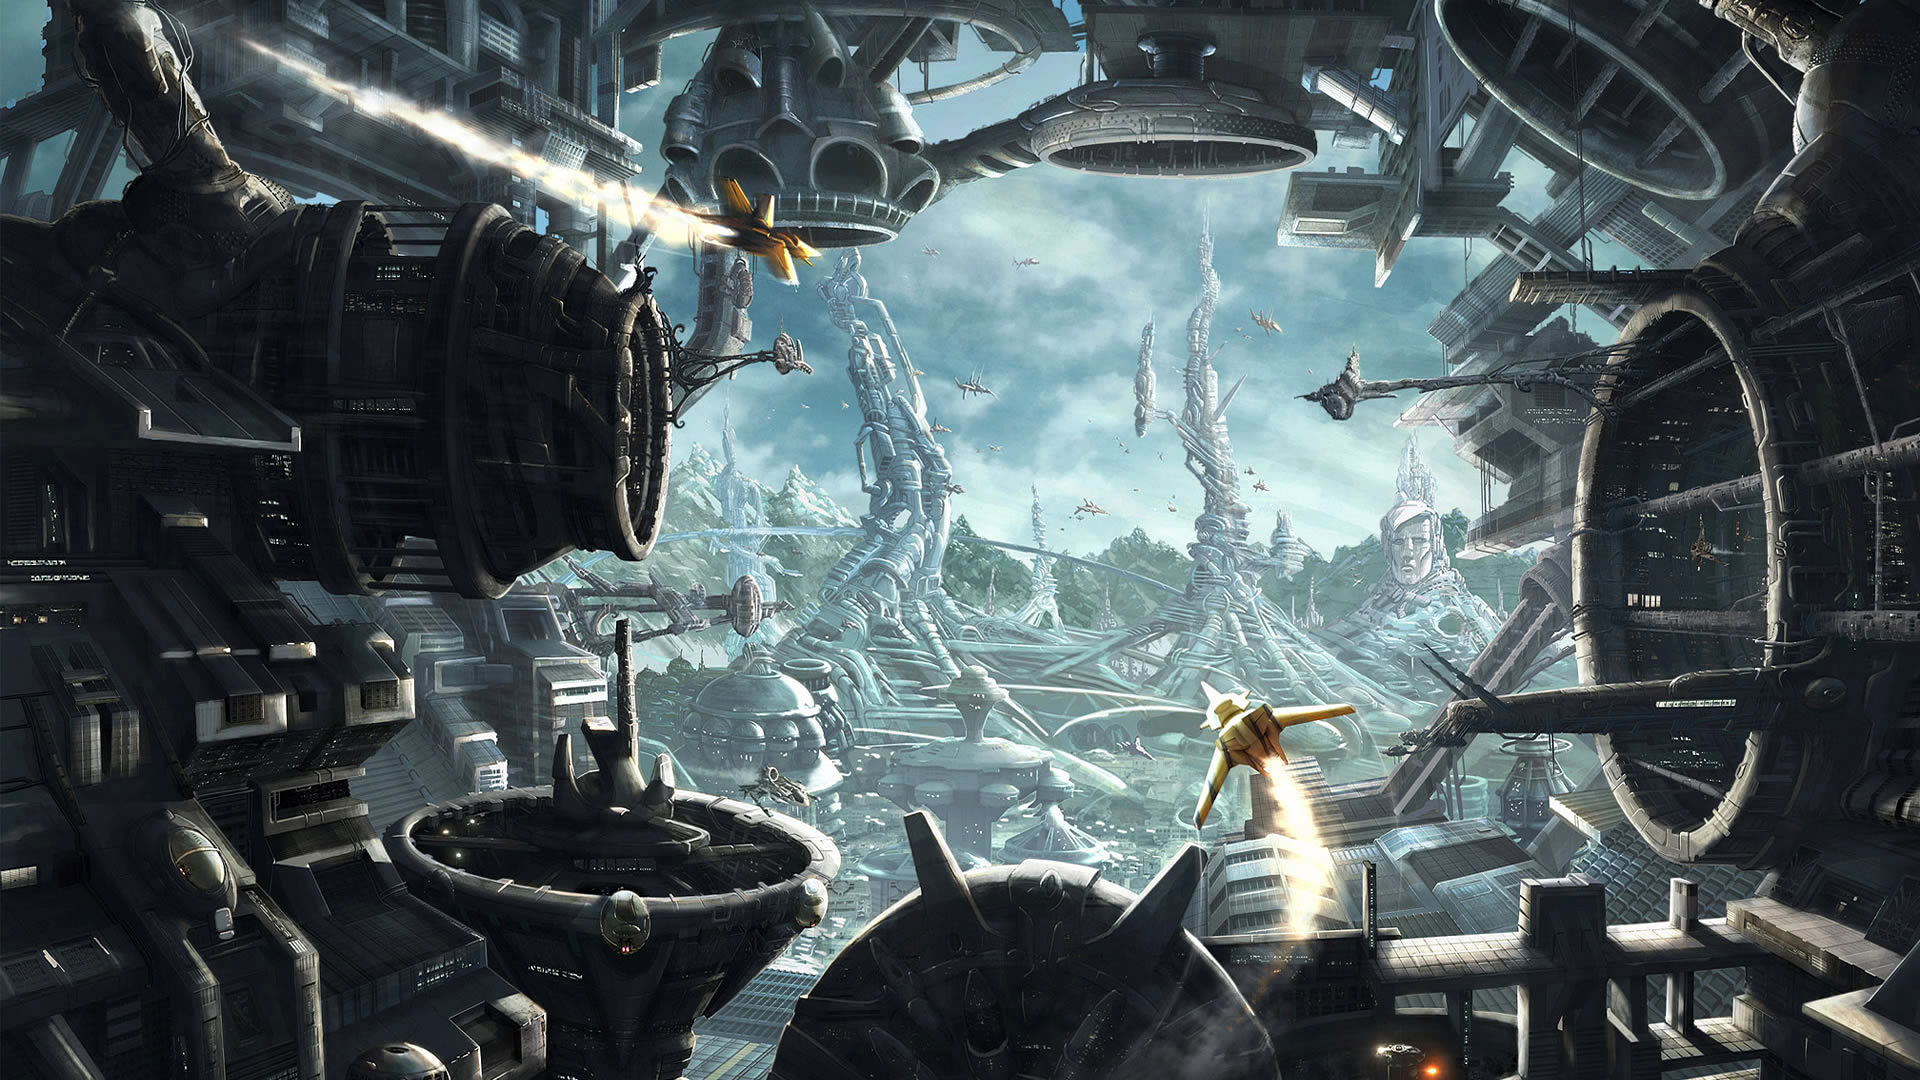 Retro Sci Fi Wallpaper (67+ images)